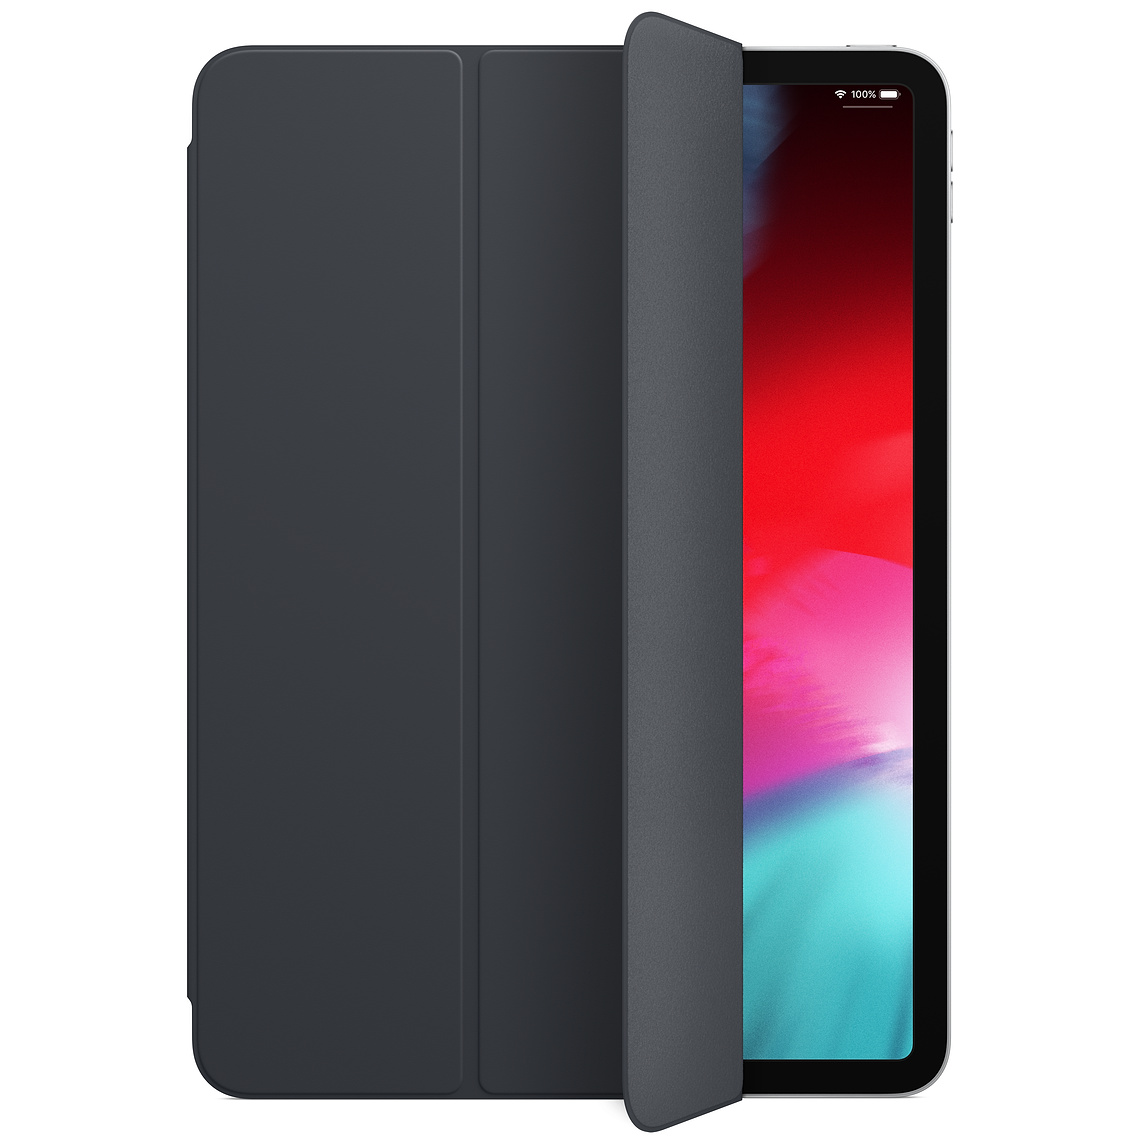 Best Accessories for Apple iPad Pro 2018 4. Smart Folio Cover